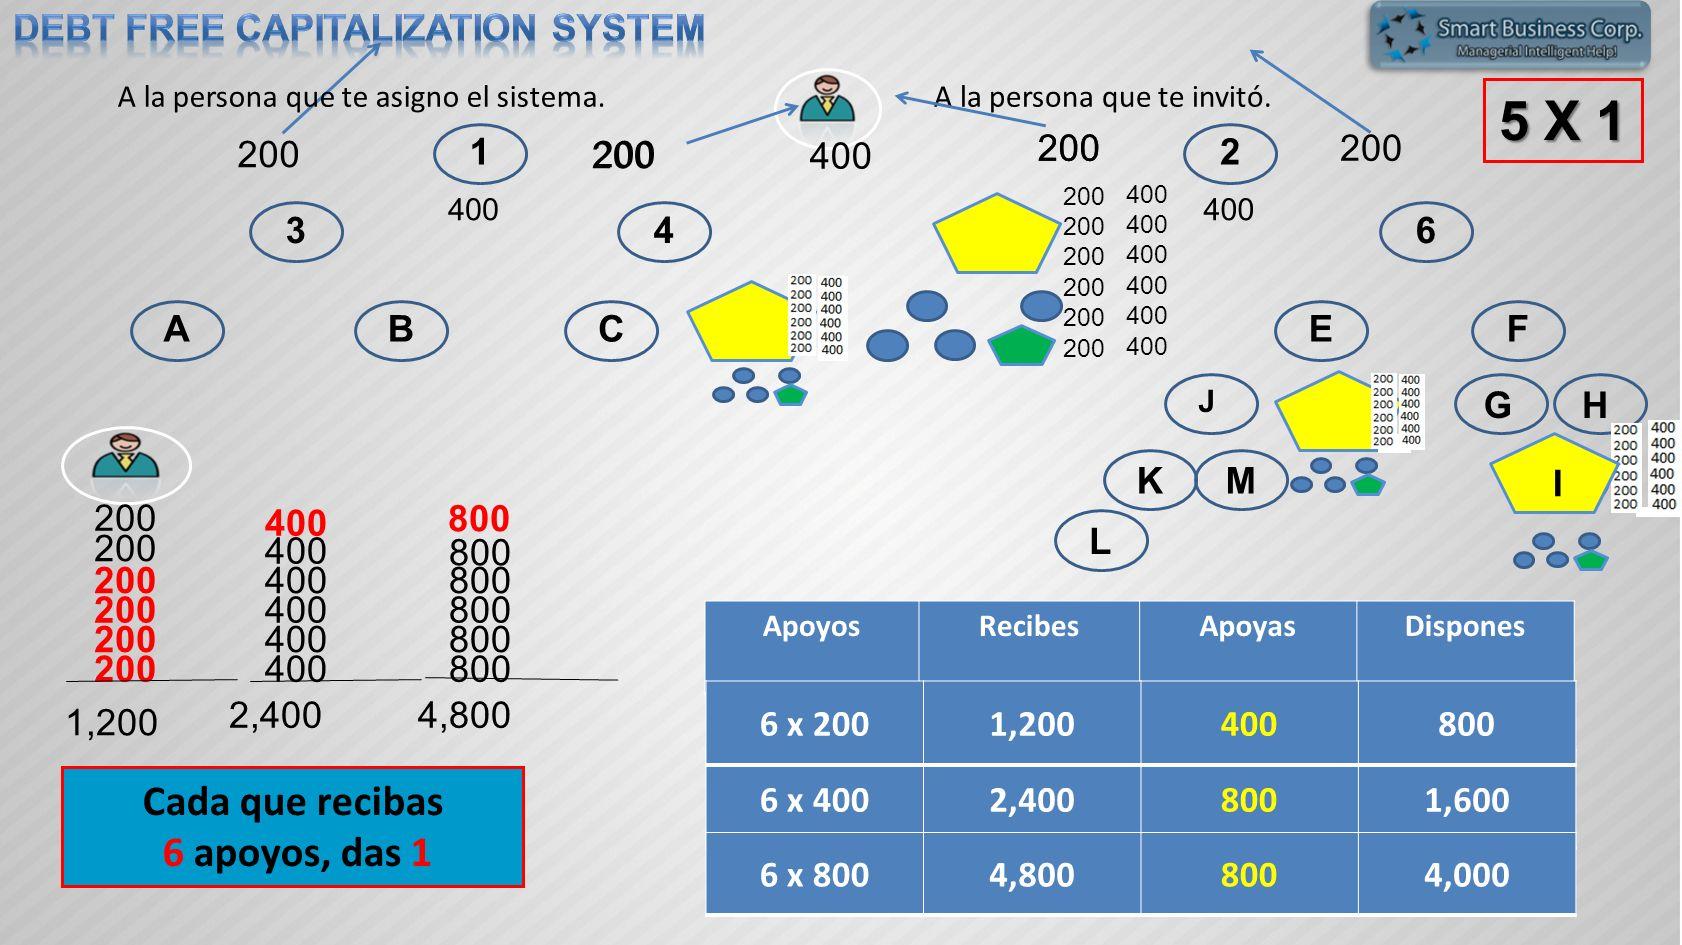 12 3456 ABCDEF GH KM L J N 400 200 5 X 1 200 400 200 1,200 400 2,400 800 4,800 Cada que recibas 6 apoyos, das 1 200 ApoyosRecibesApoyasDispones 6 x 40